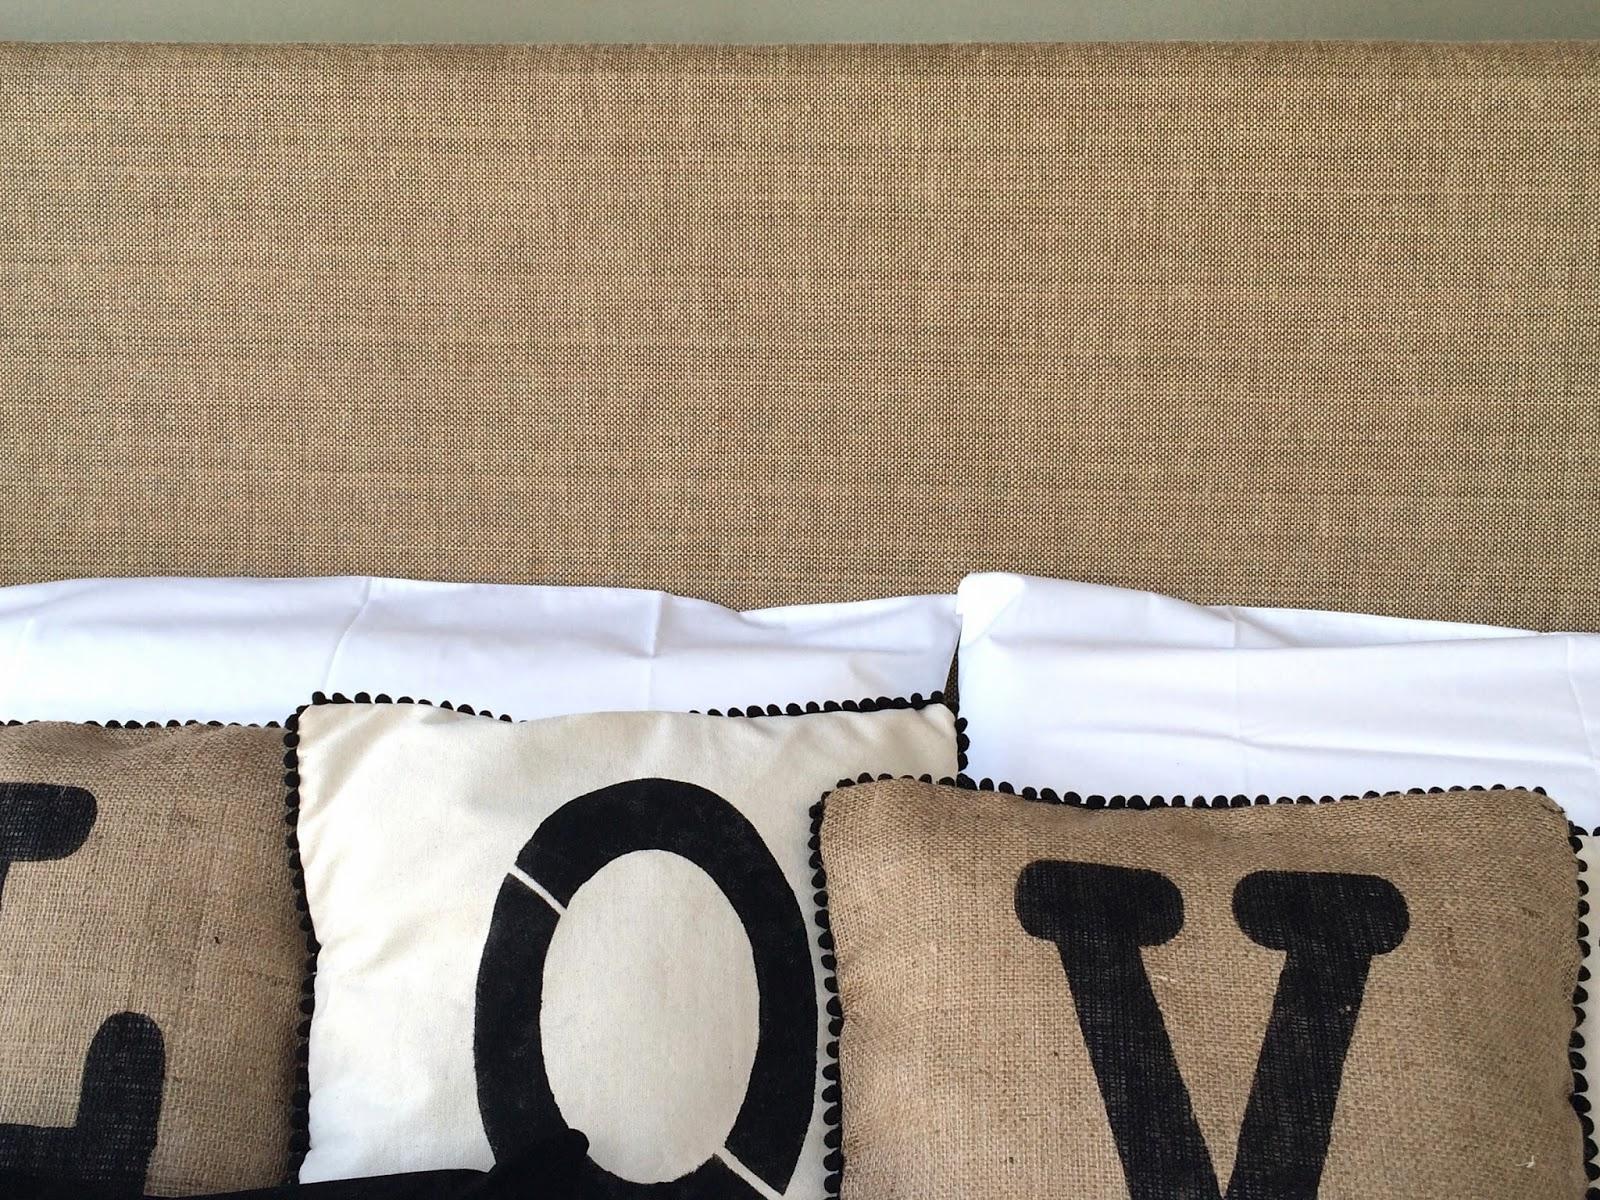 alma deco buenos aires respaldo de rafia. Black Bedroom Furniture Sets. Home Design Ideas